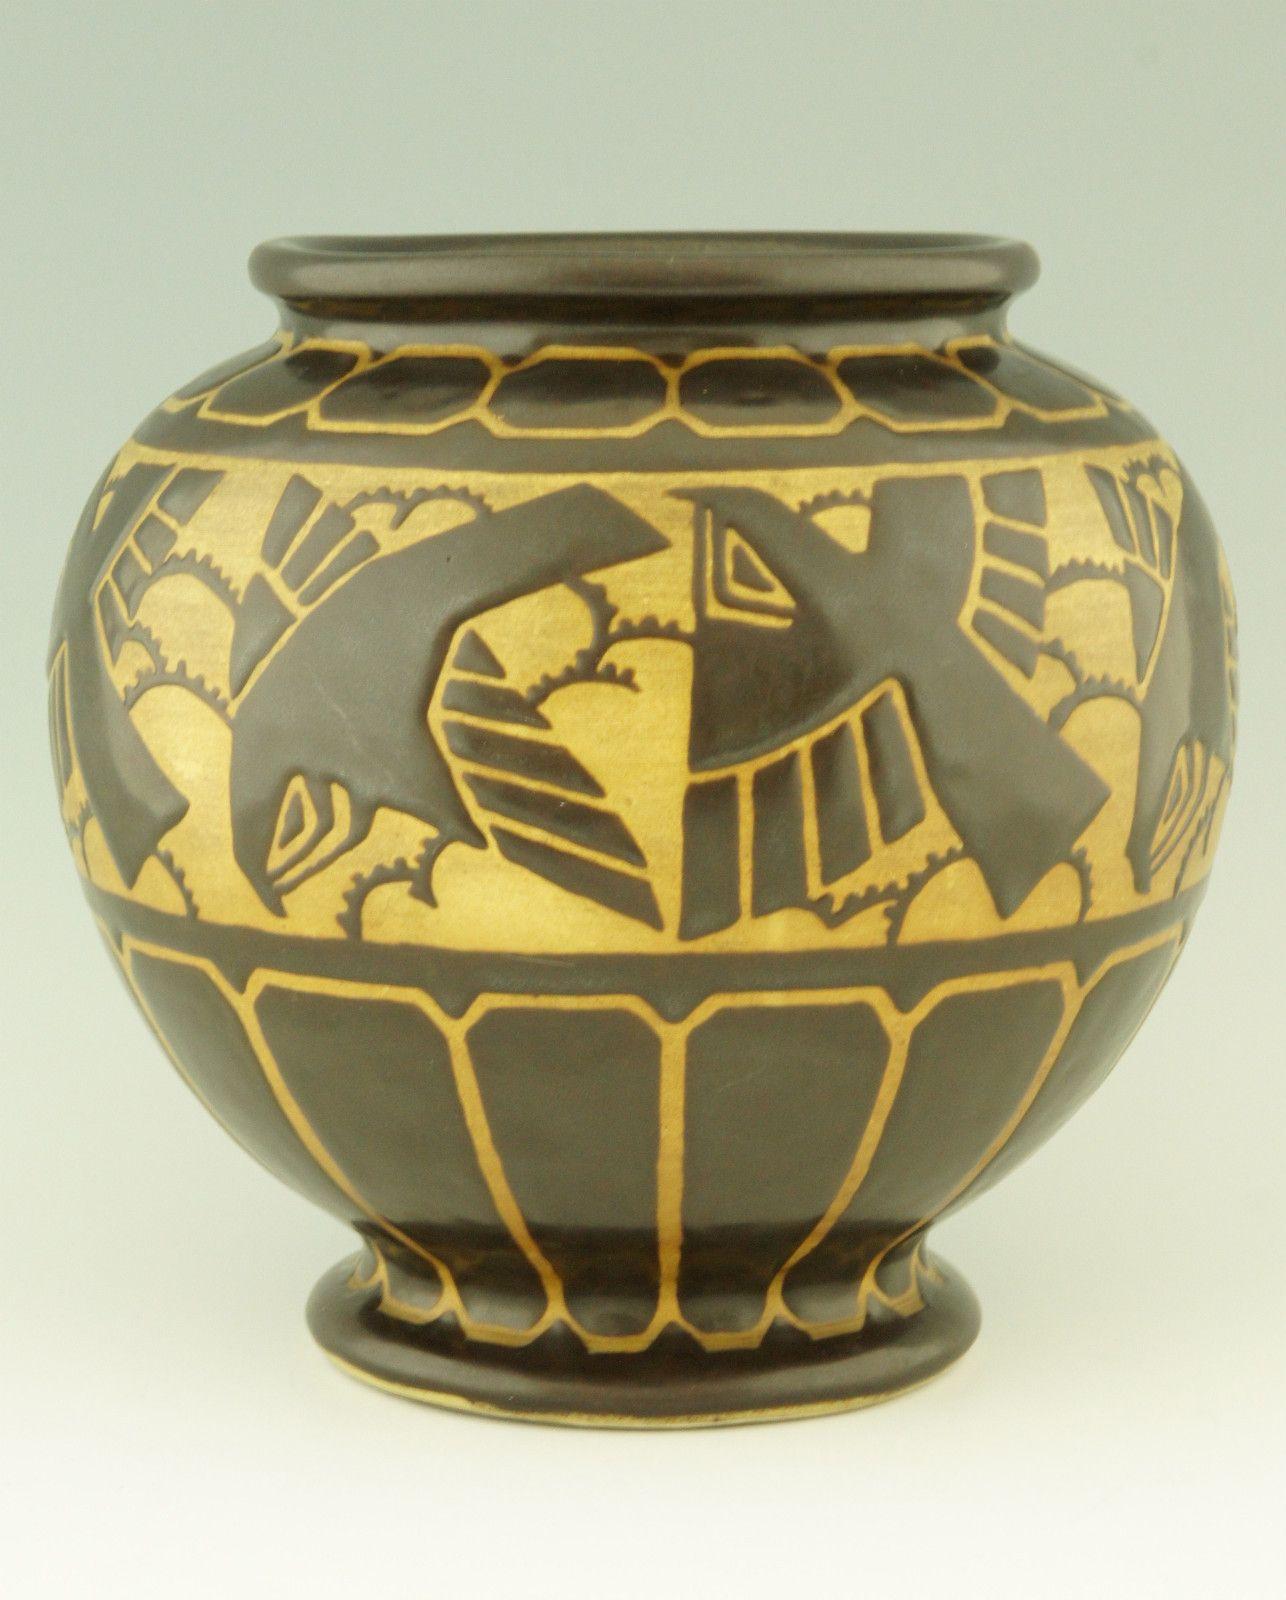 Art deco grès keramis vase with birds by charles catteau belgium 1925 ceramics